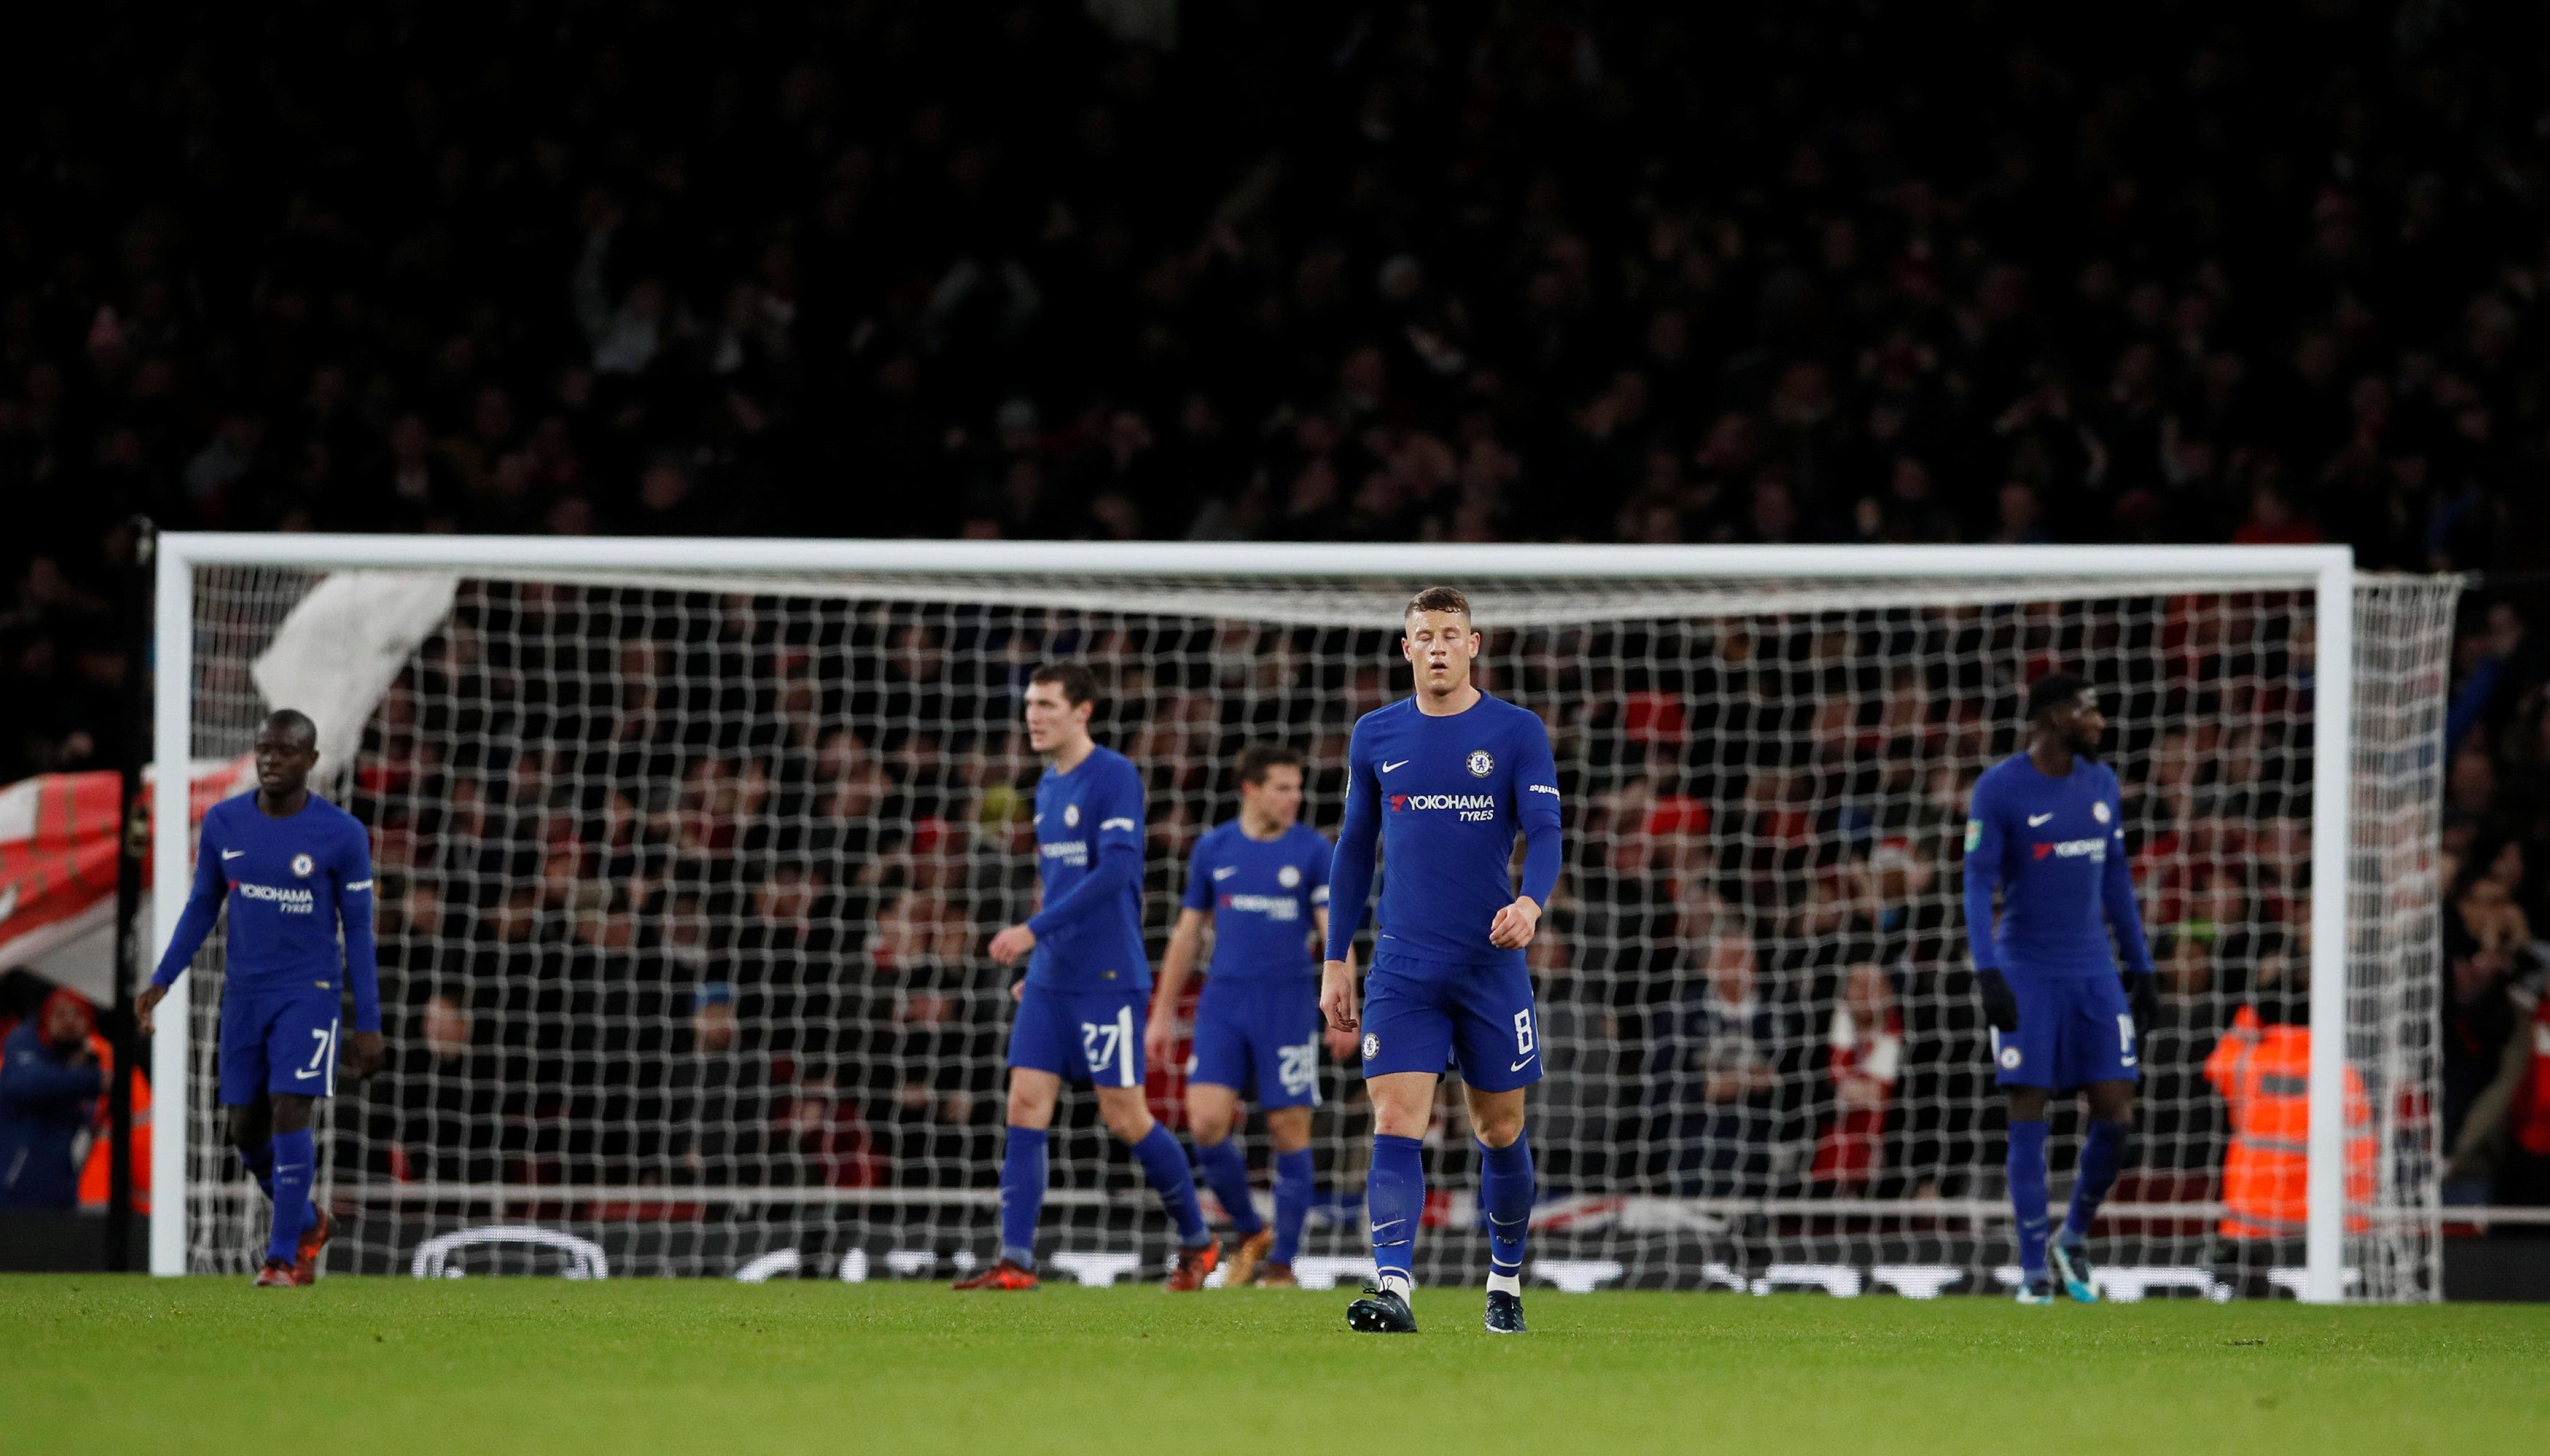 Nỗi thất vọng của các cầu thủ Chelsea sau trận thua Arsenal. Ảnh: REUTERS